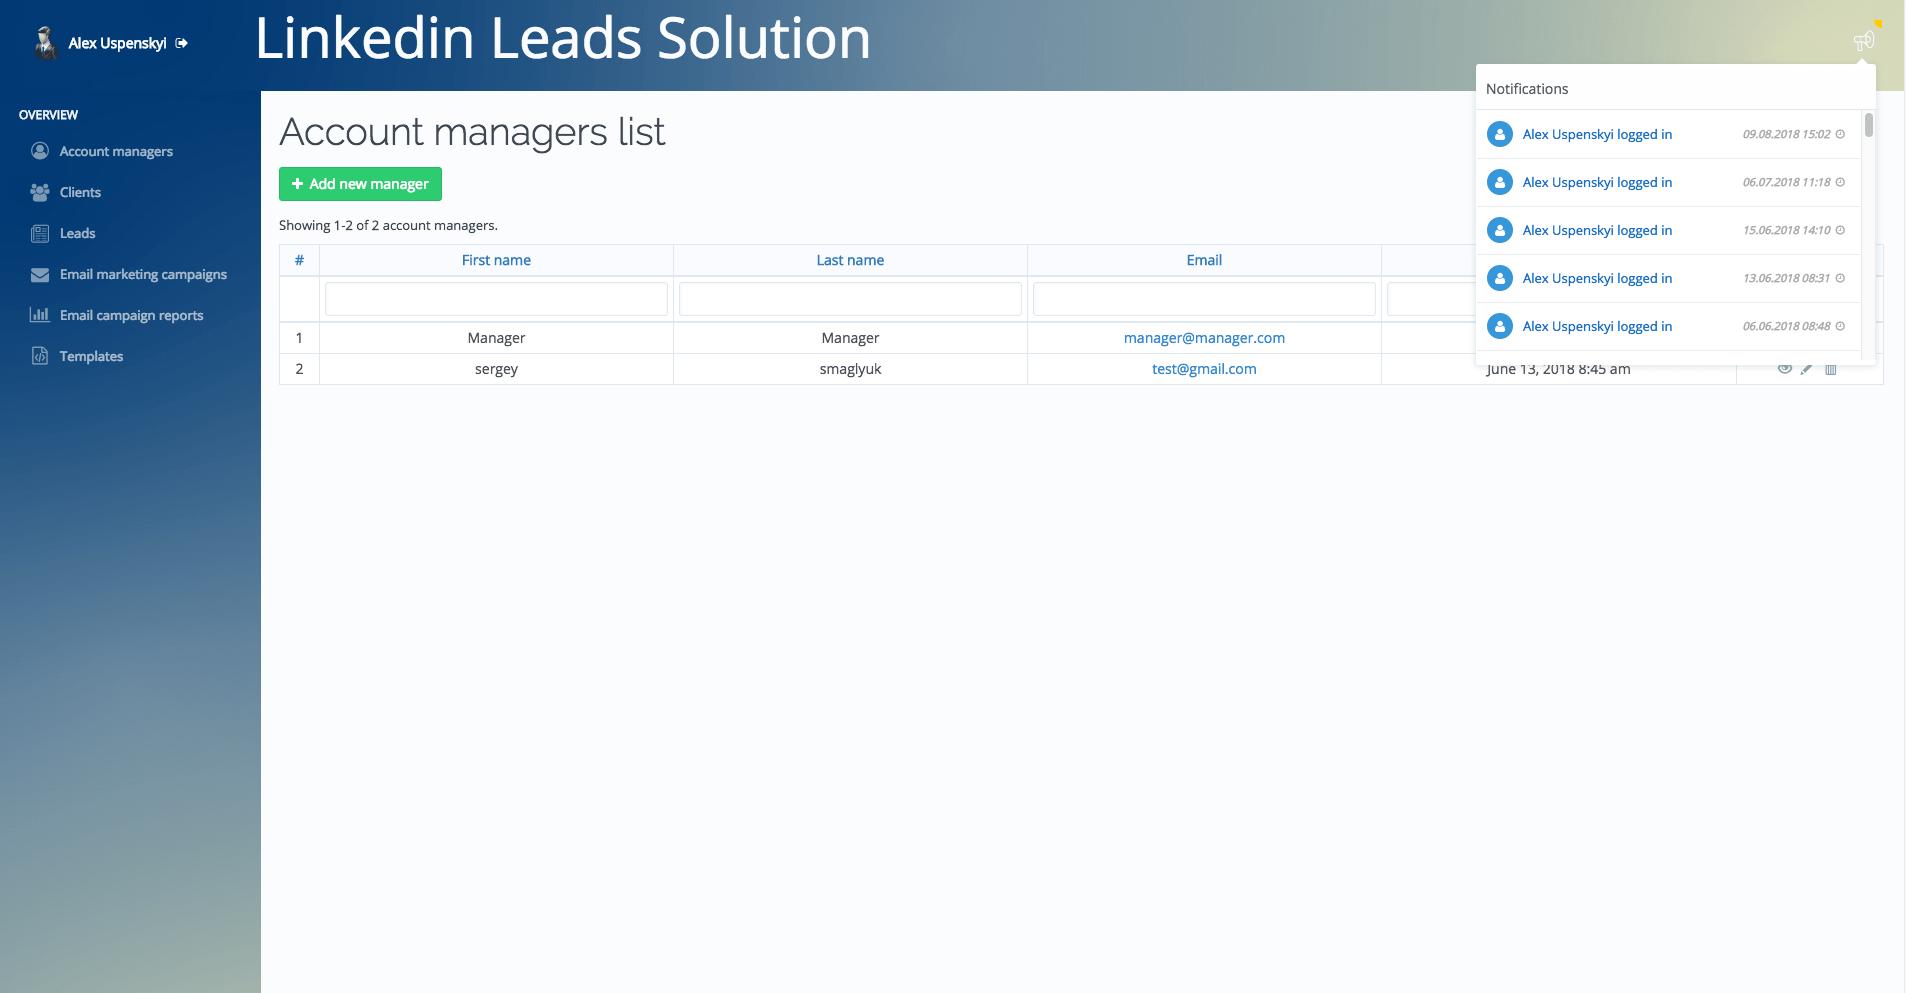 linkedin-leads-solution5b6c585d652fec1ddac9711f